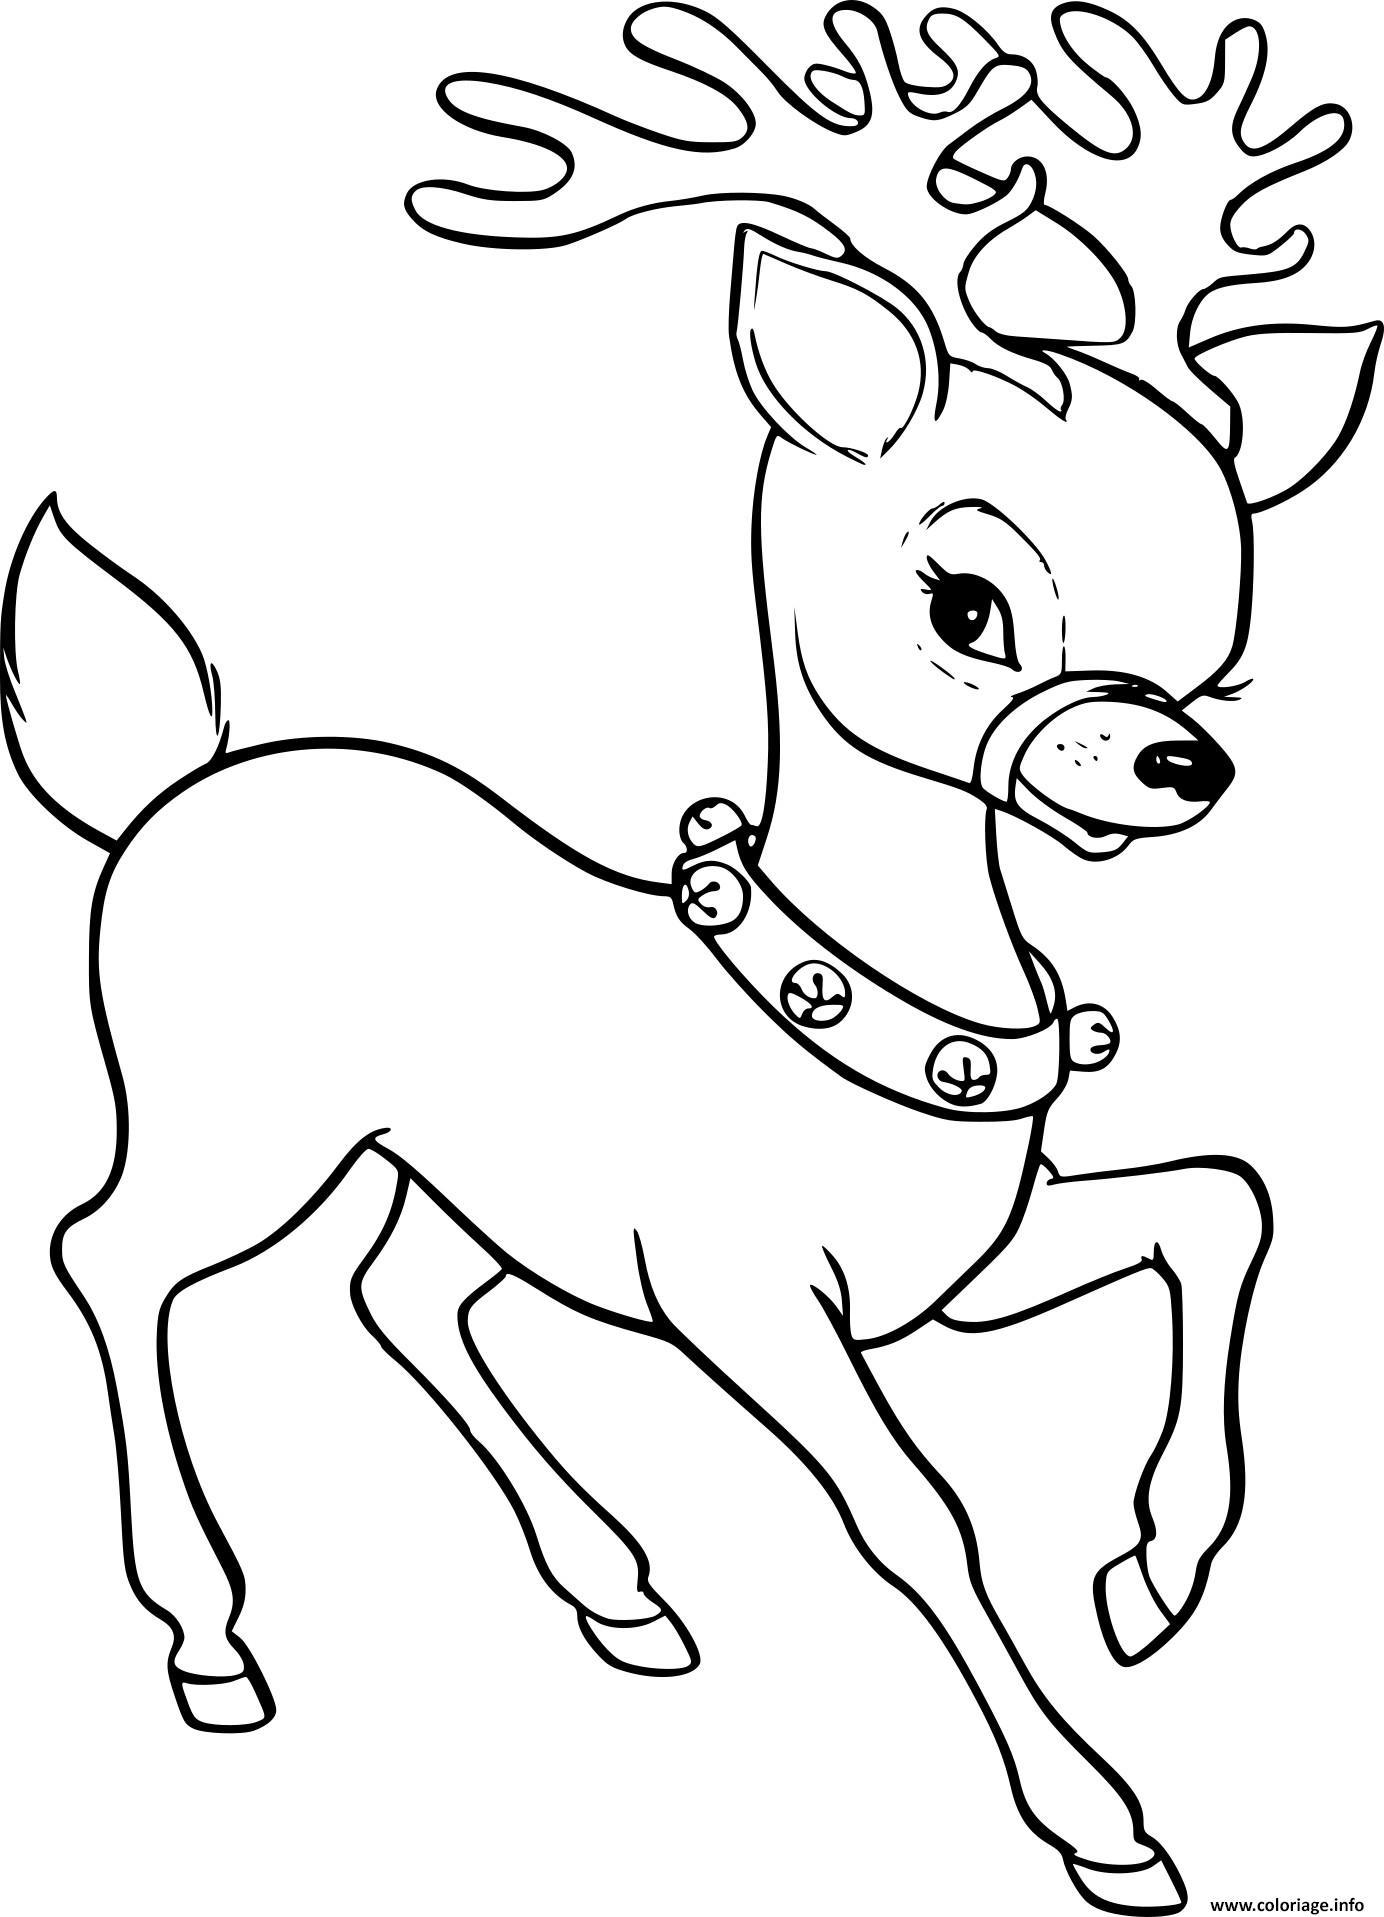 Coloriage Renne De Noel Femelle dessin